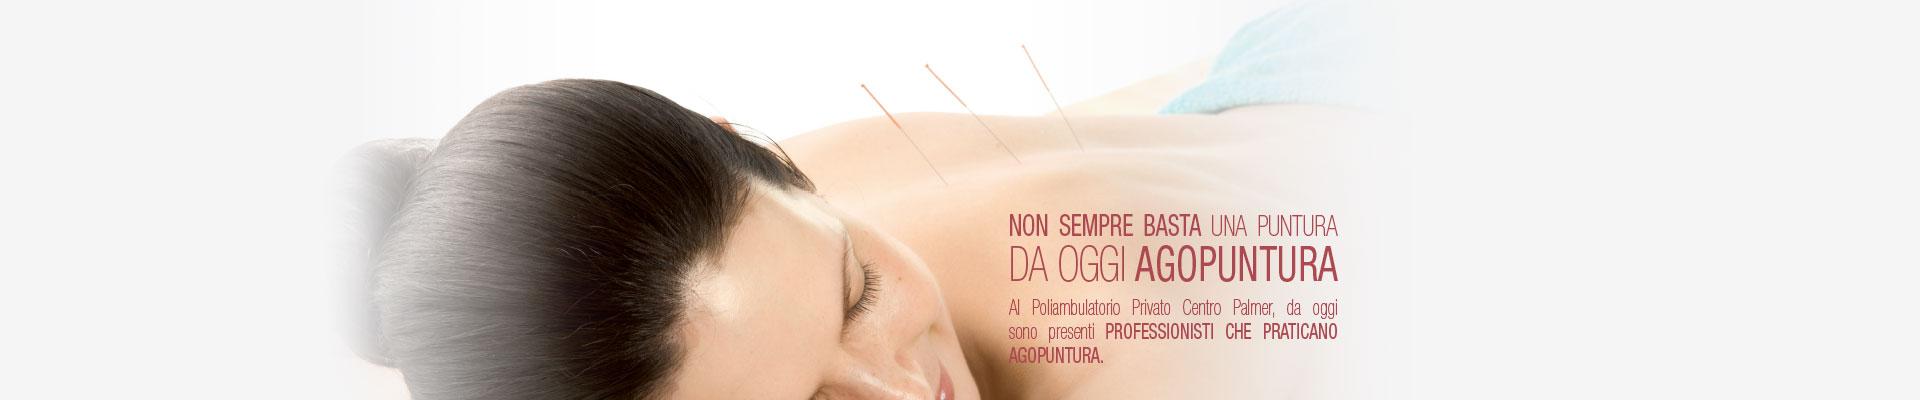 Da oggi Agopuntura - Centro Palmer